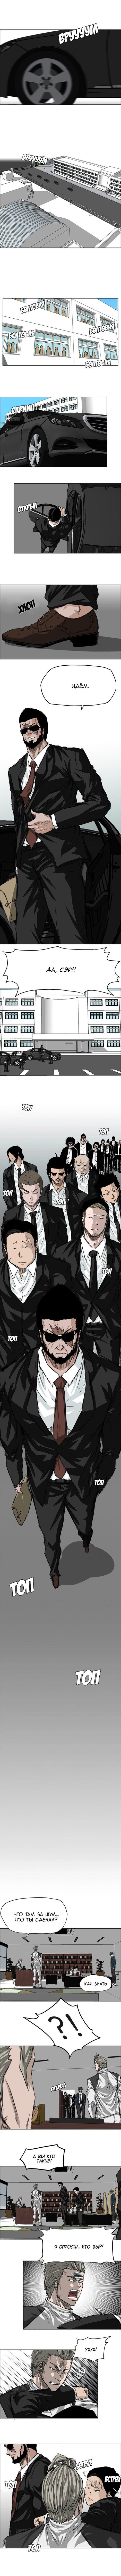 https://r2.ninemanga.com/comics/pic4/61/37949/1401721/1561219211998.jpg Page 2